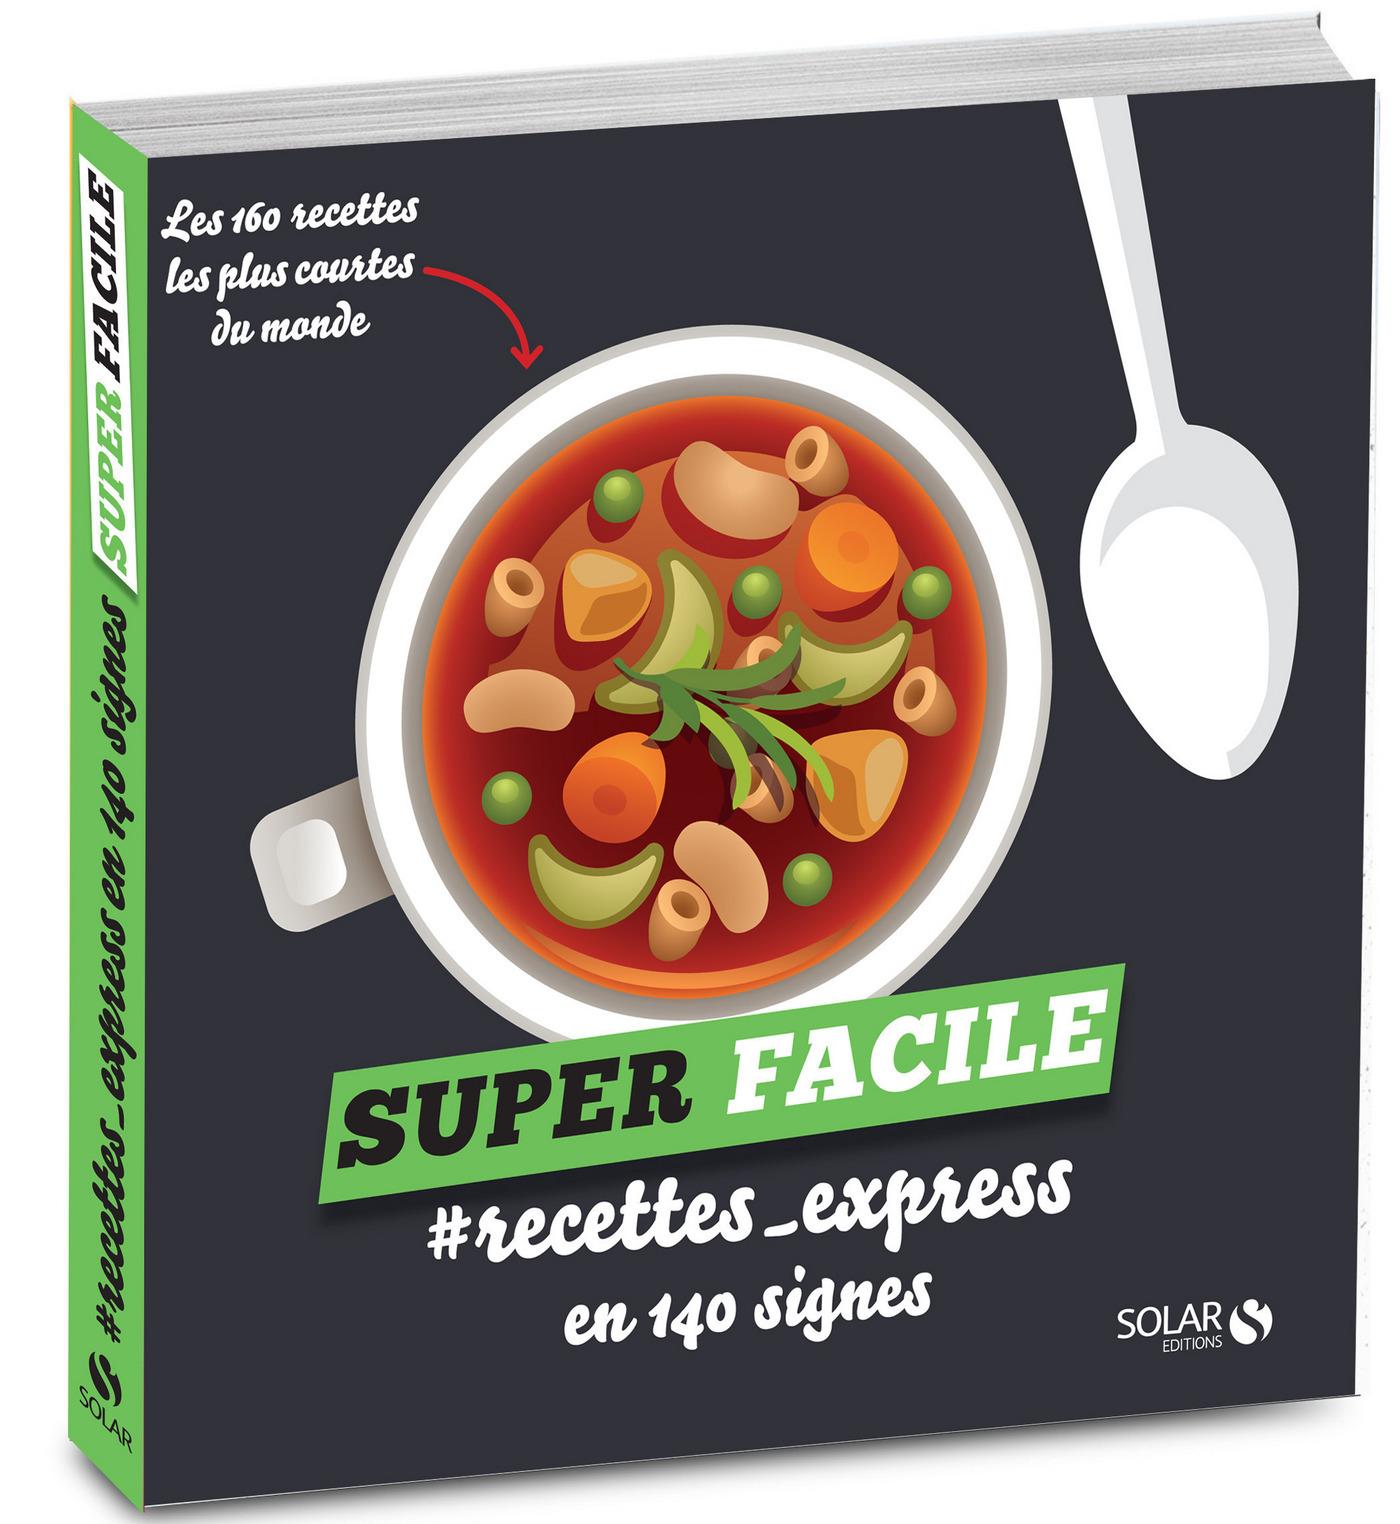 #recettes_express en 140 signes - super facile